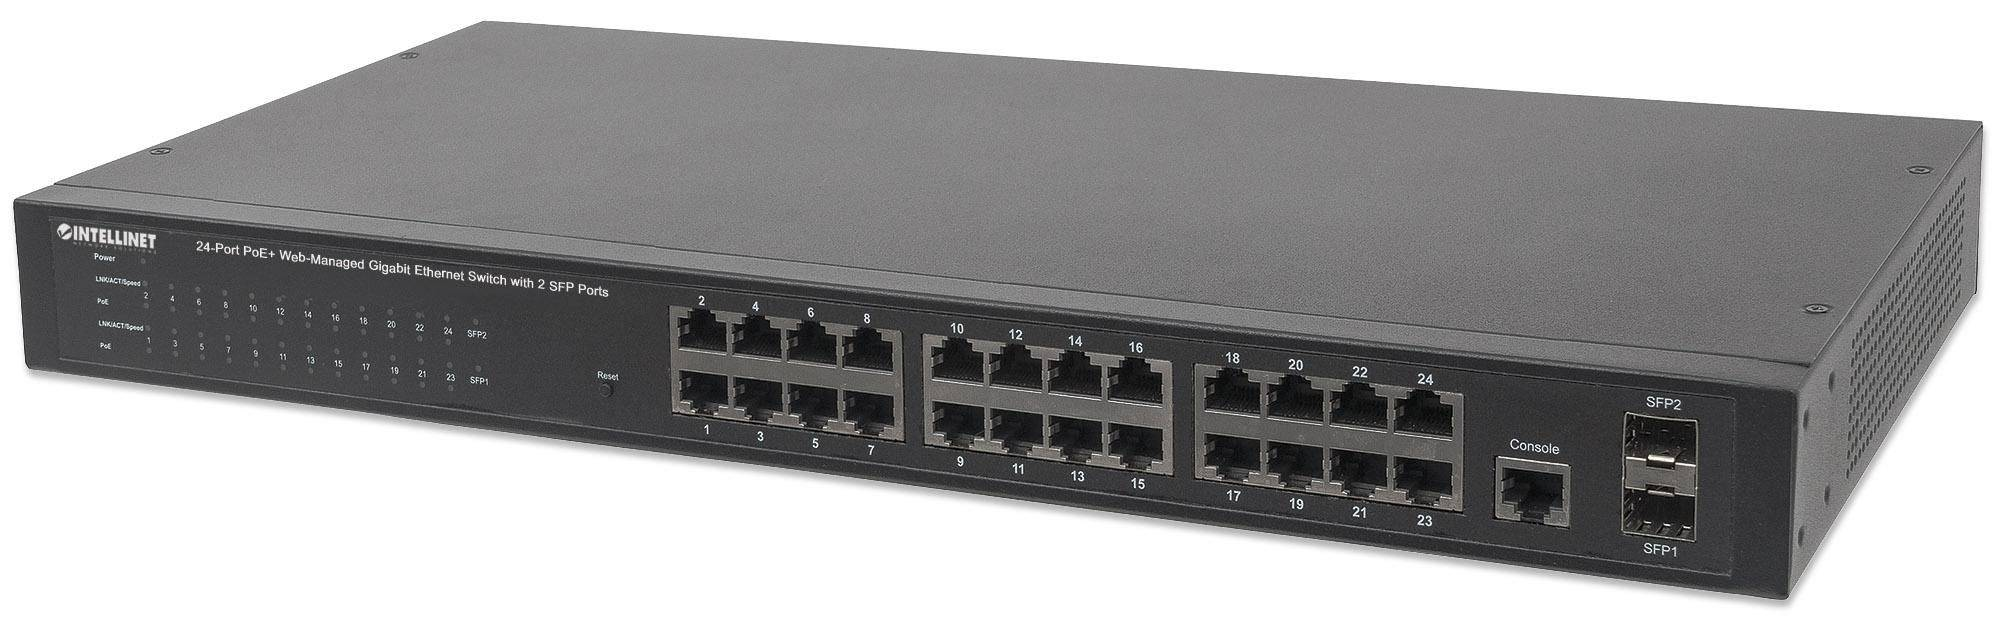 Intellinet Switch 24 Porte PoE Web-Managed Gigabit Ethernet con 2 Porte SFP